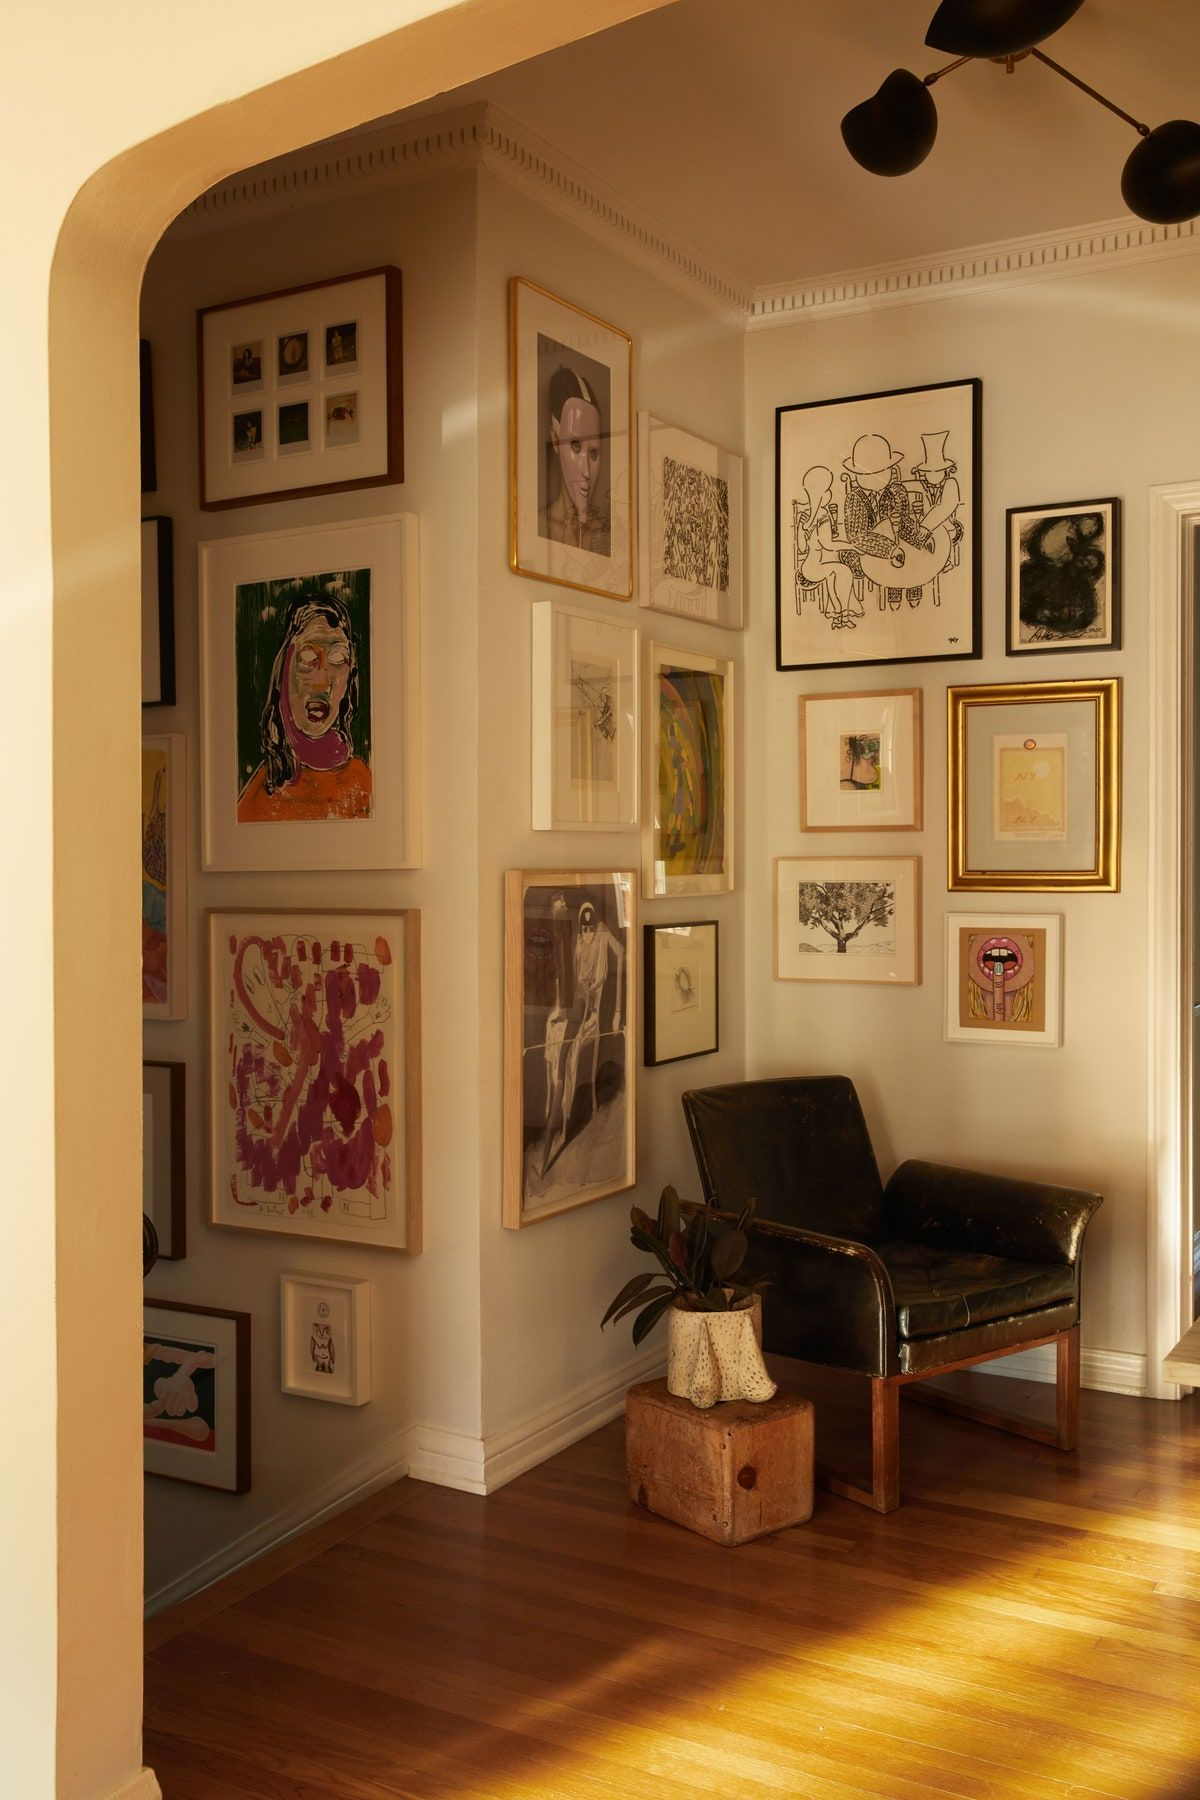 More Inside the Light-Filled Los Feliz Home of Two Art-World Wonders